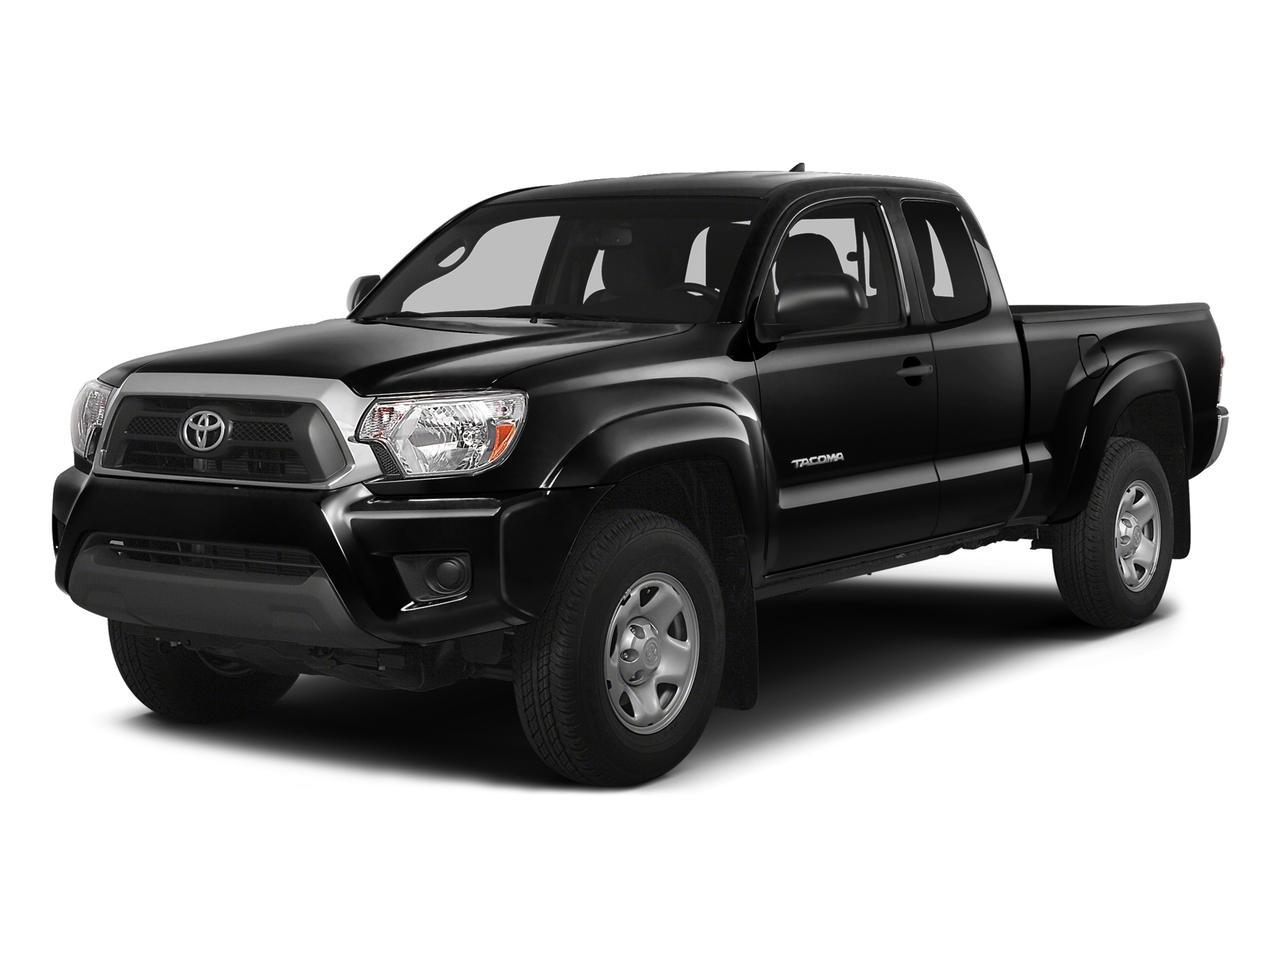 2015 Toyota Tacoma Vehicle Photo in Austin, TX 78759